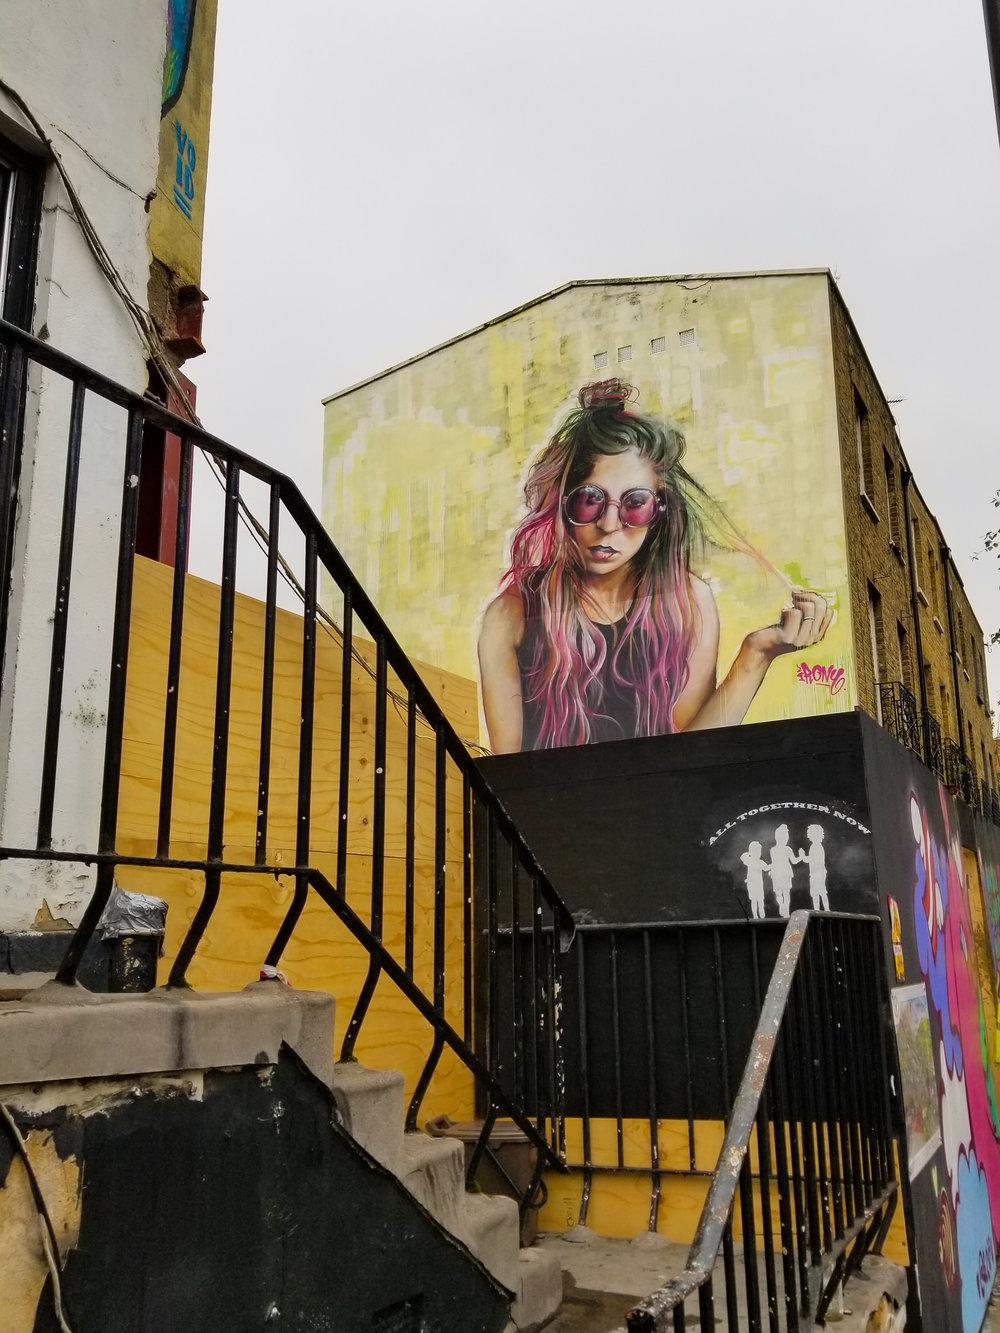 Street art in Camden.